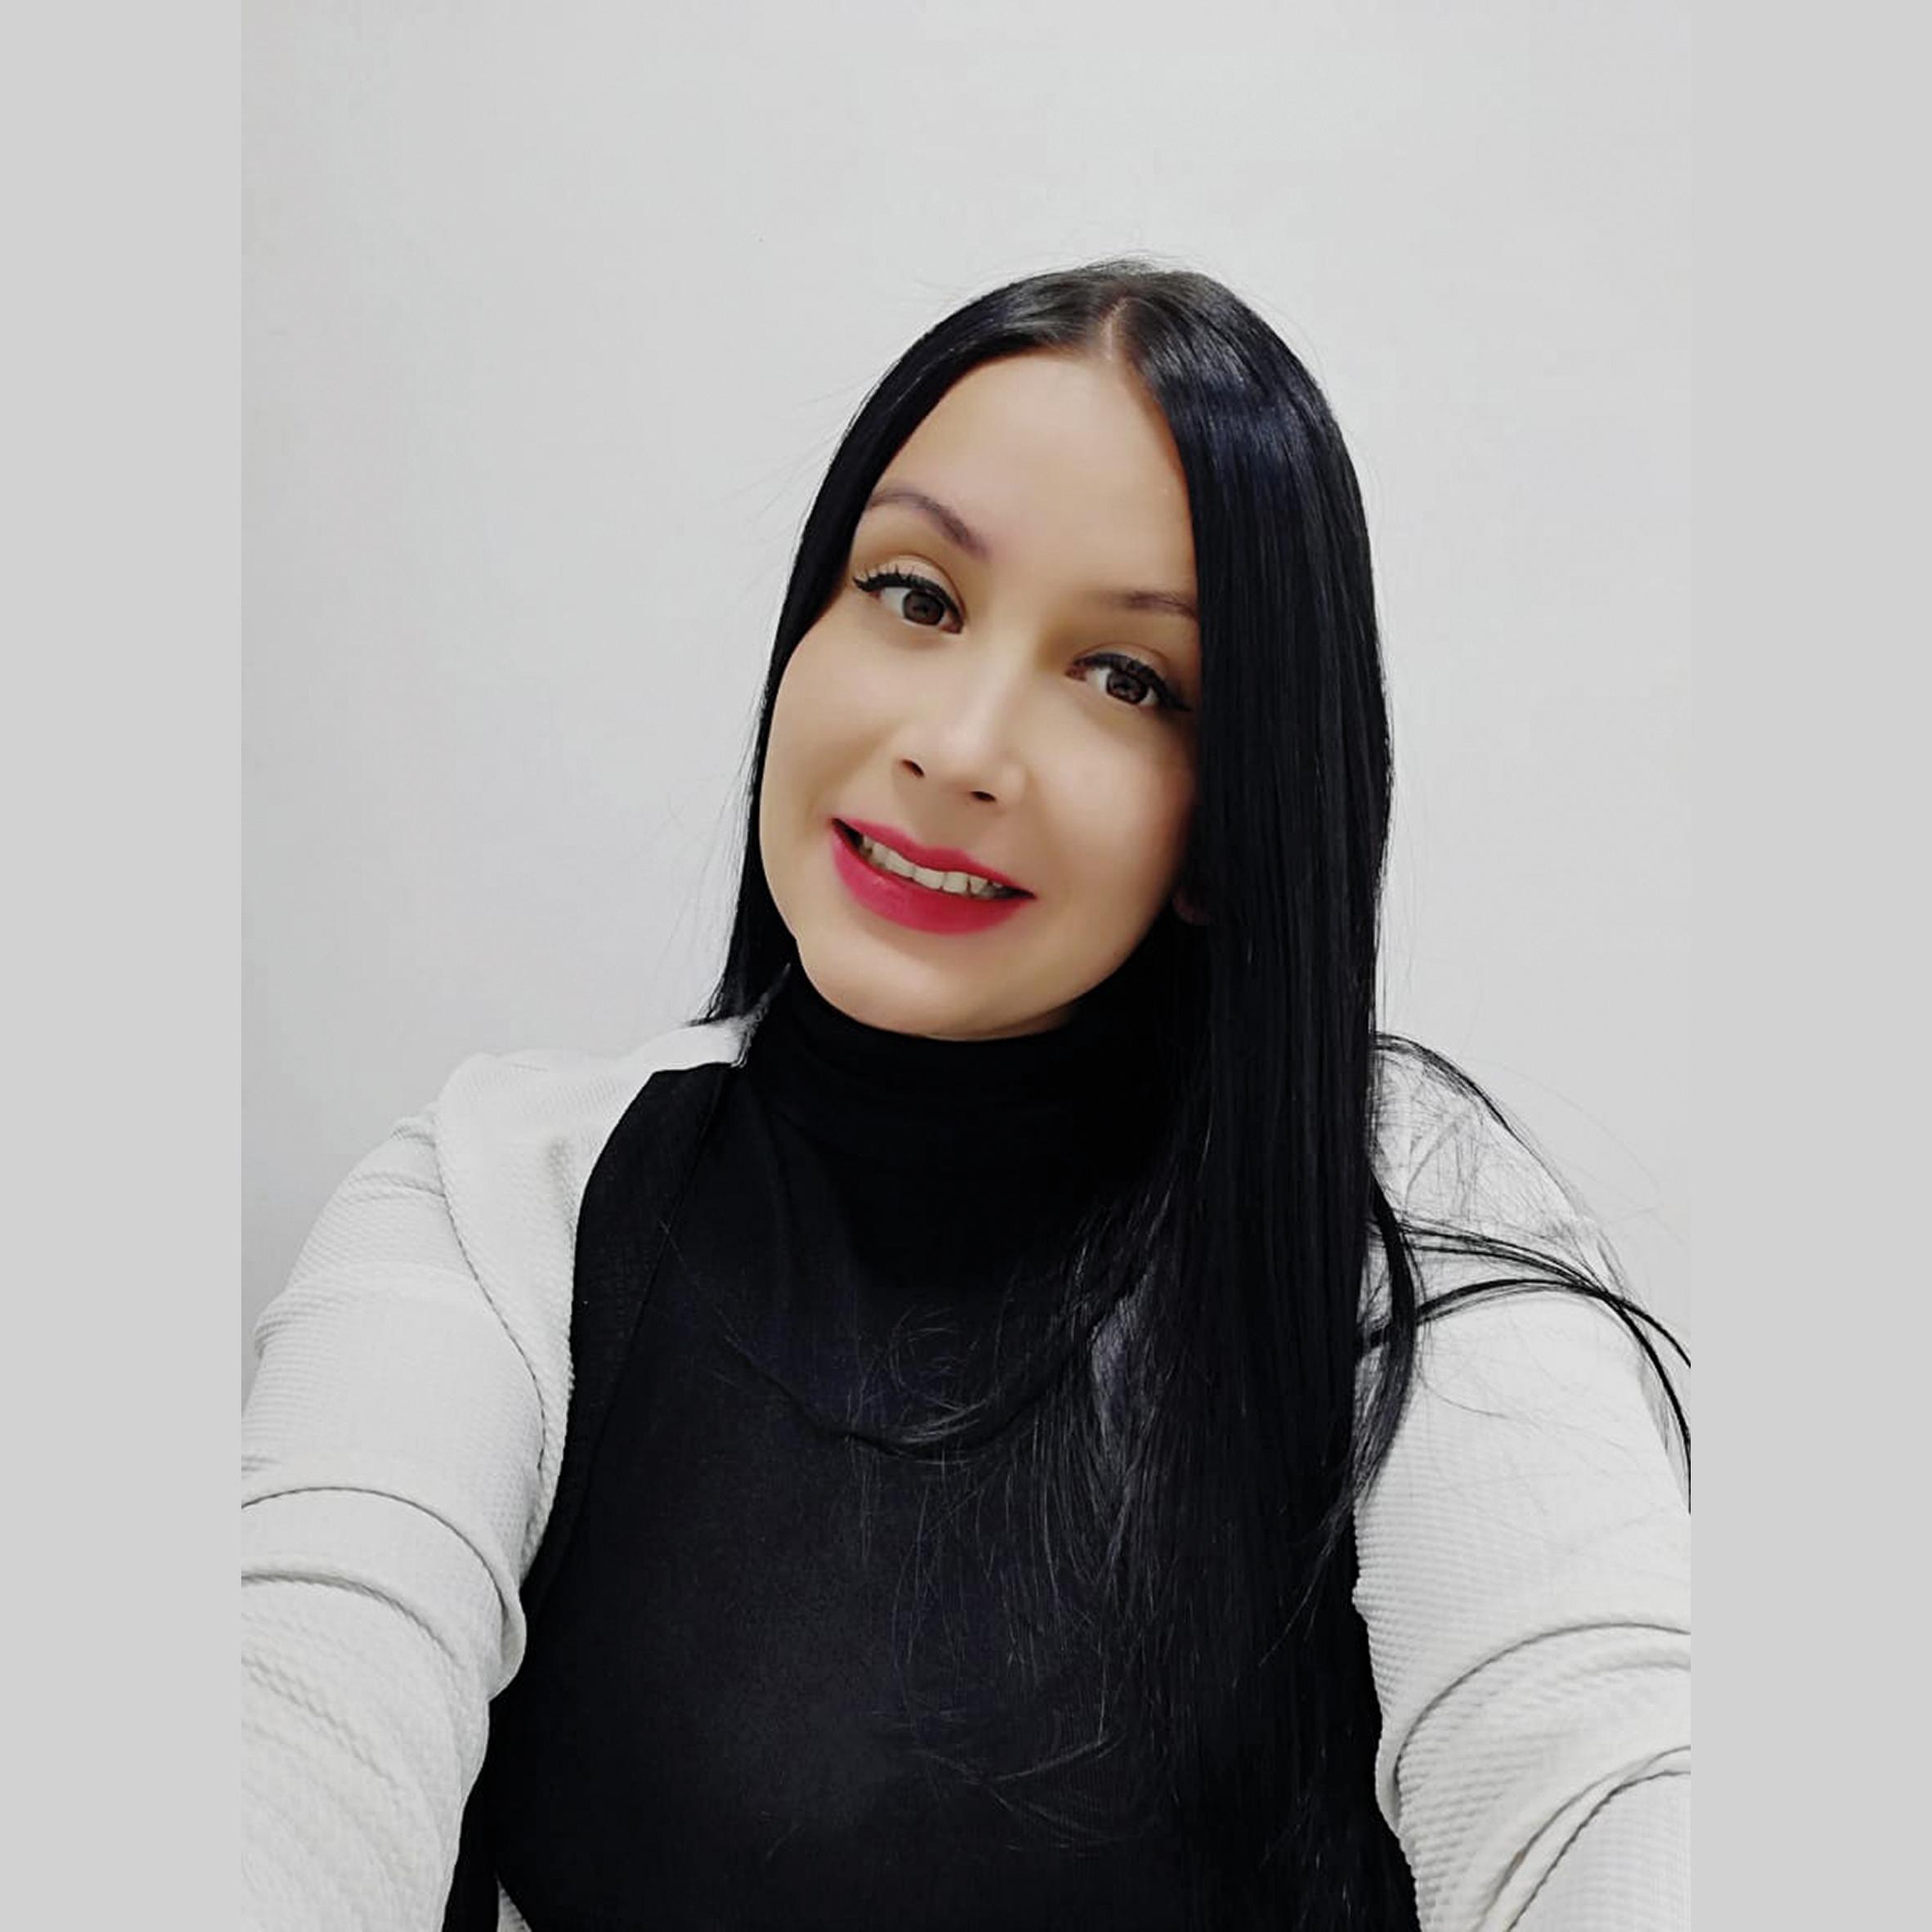 Leydi Rojas